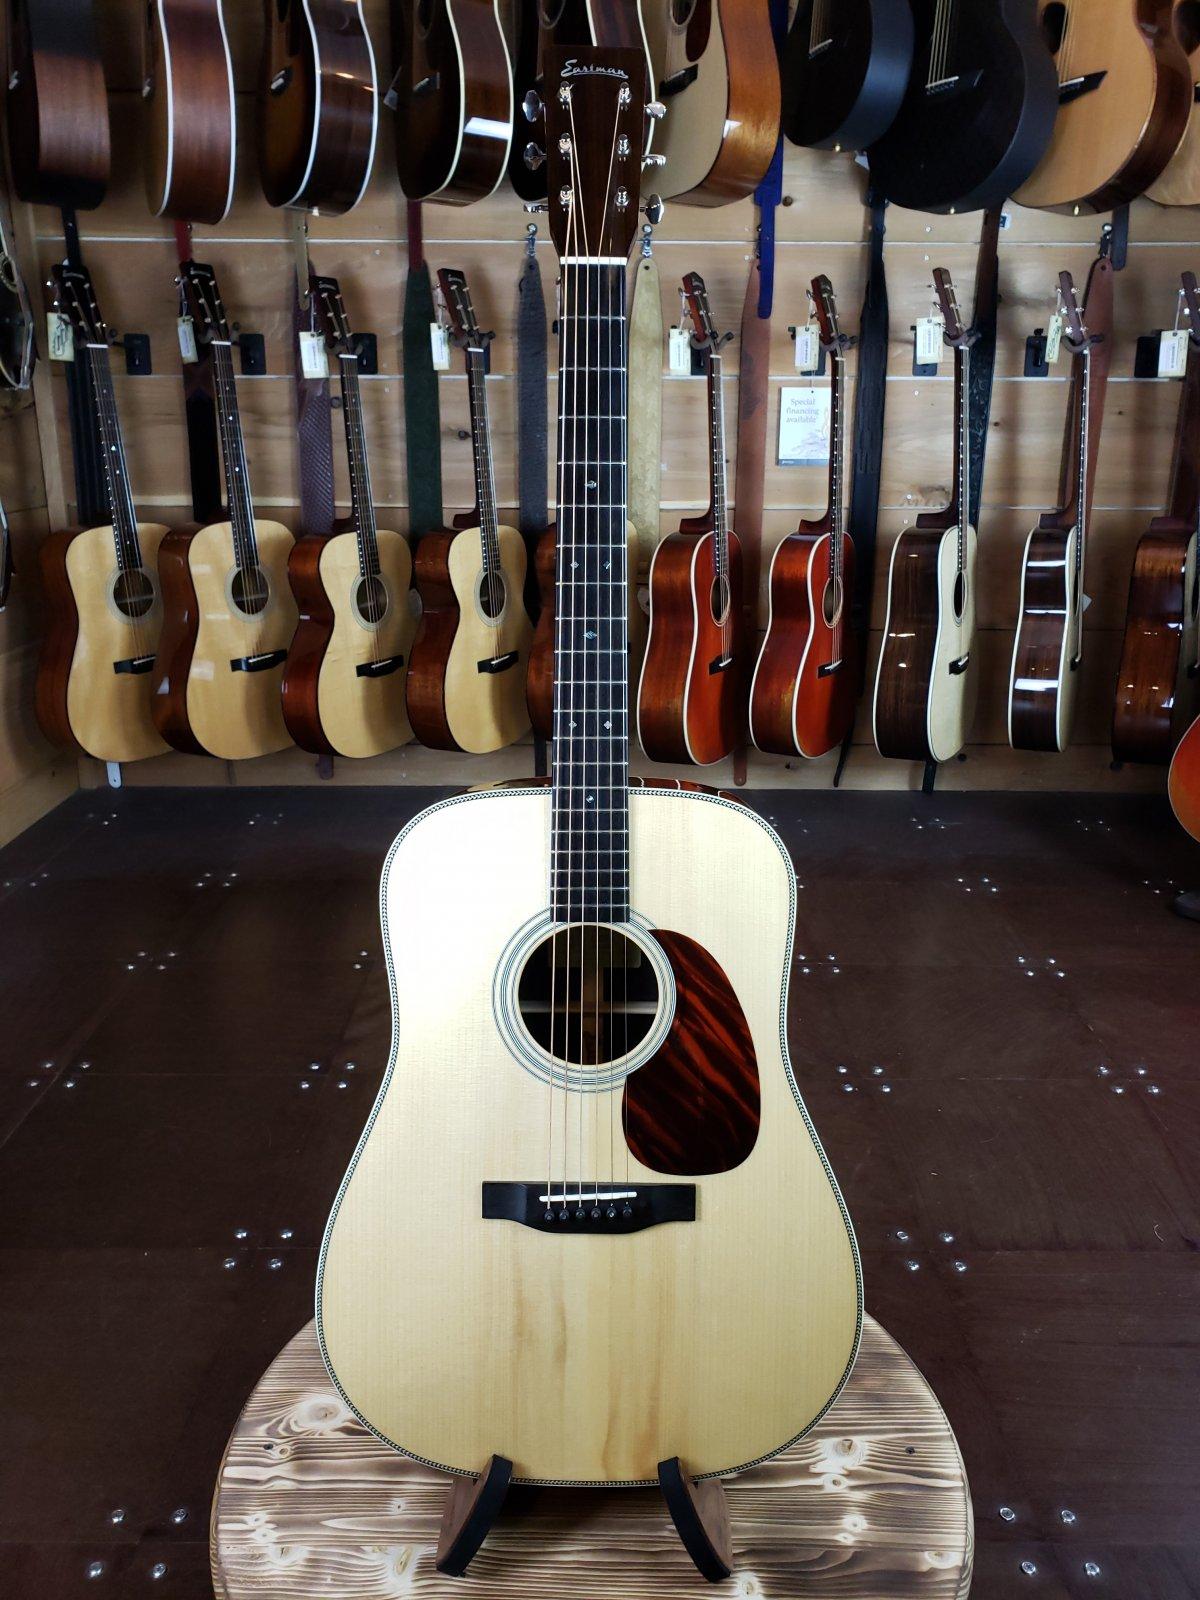 (Used) Eastman E20D Adirondack Top Dreadnaught Acoustic w/ Tortoise Shell Pickguard #6236